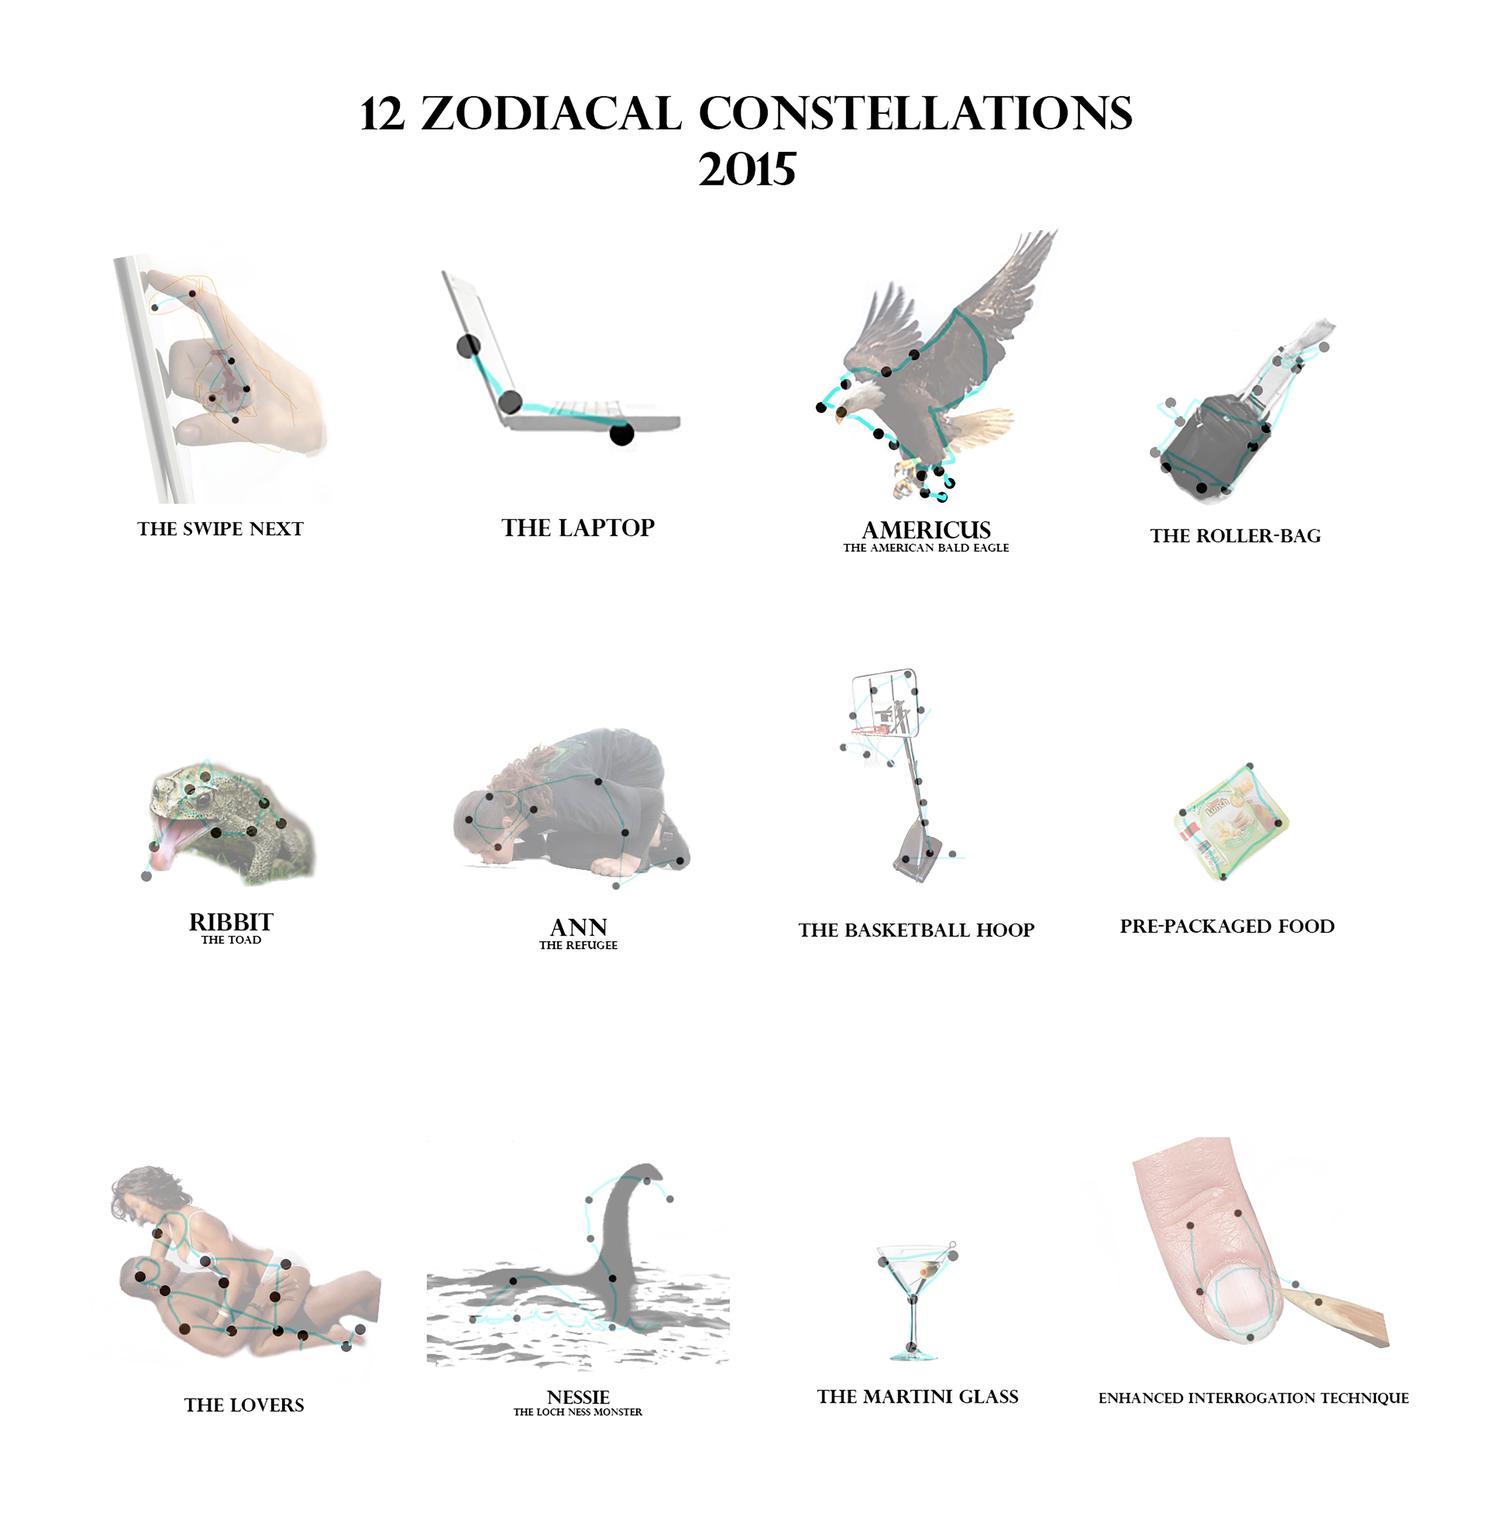 12ZodiacalConstellations(presm349).jpg